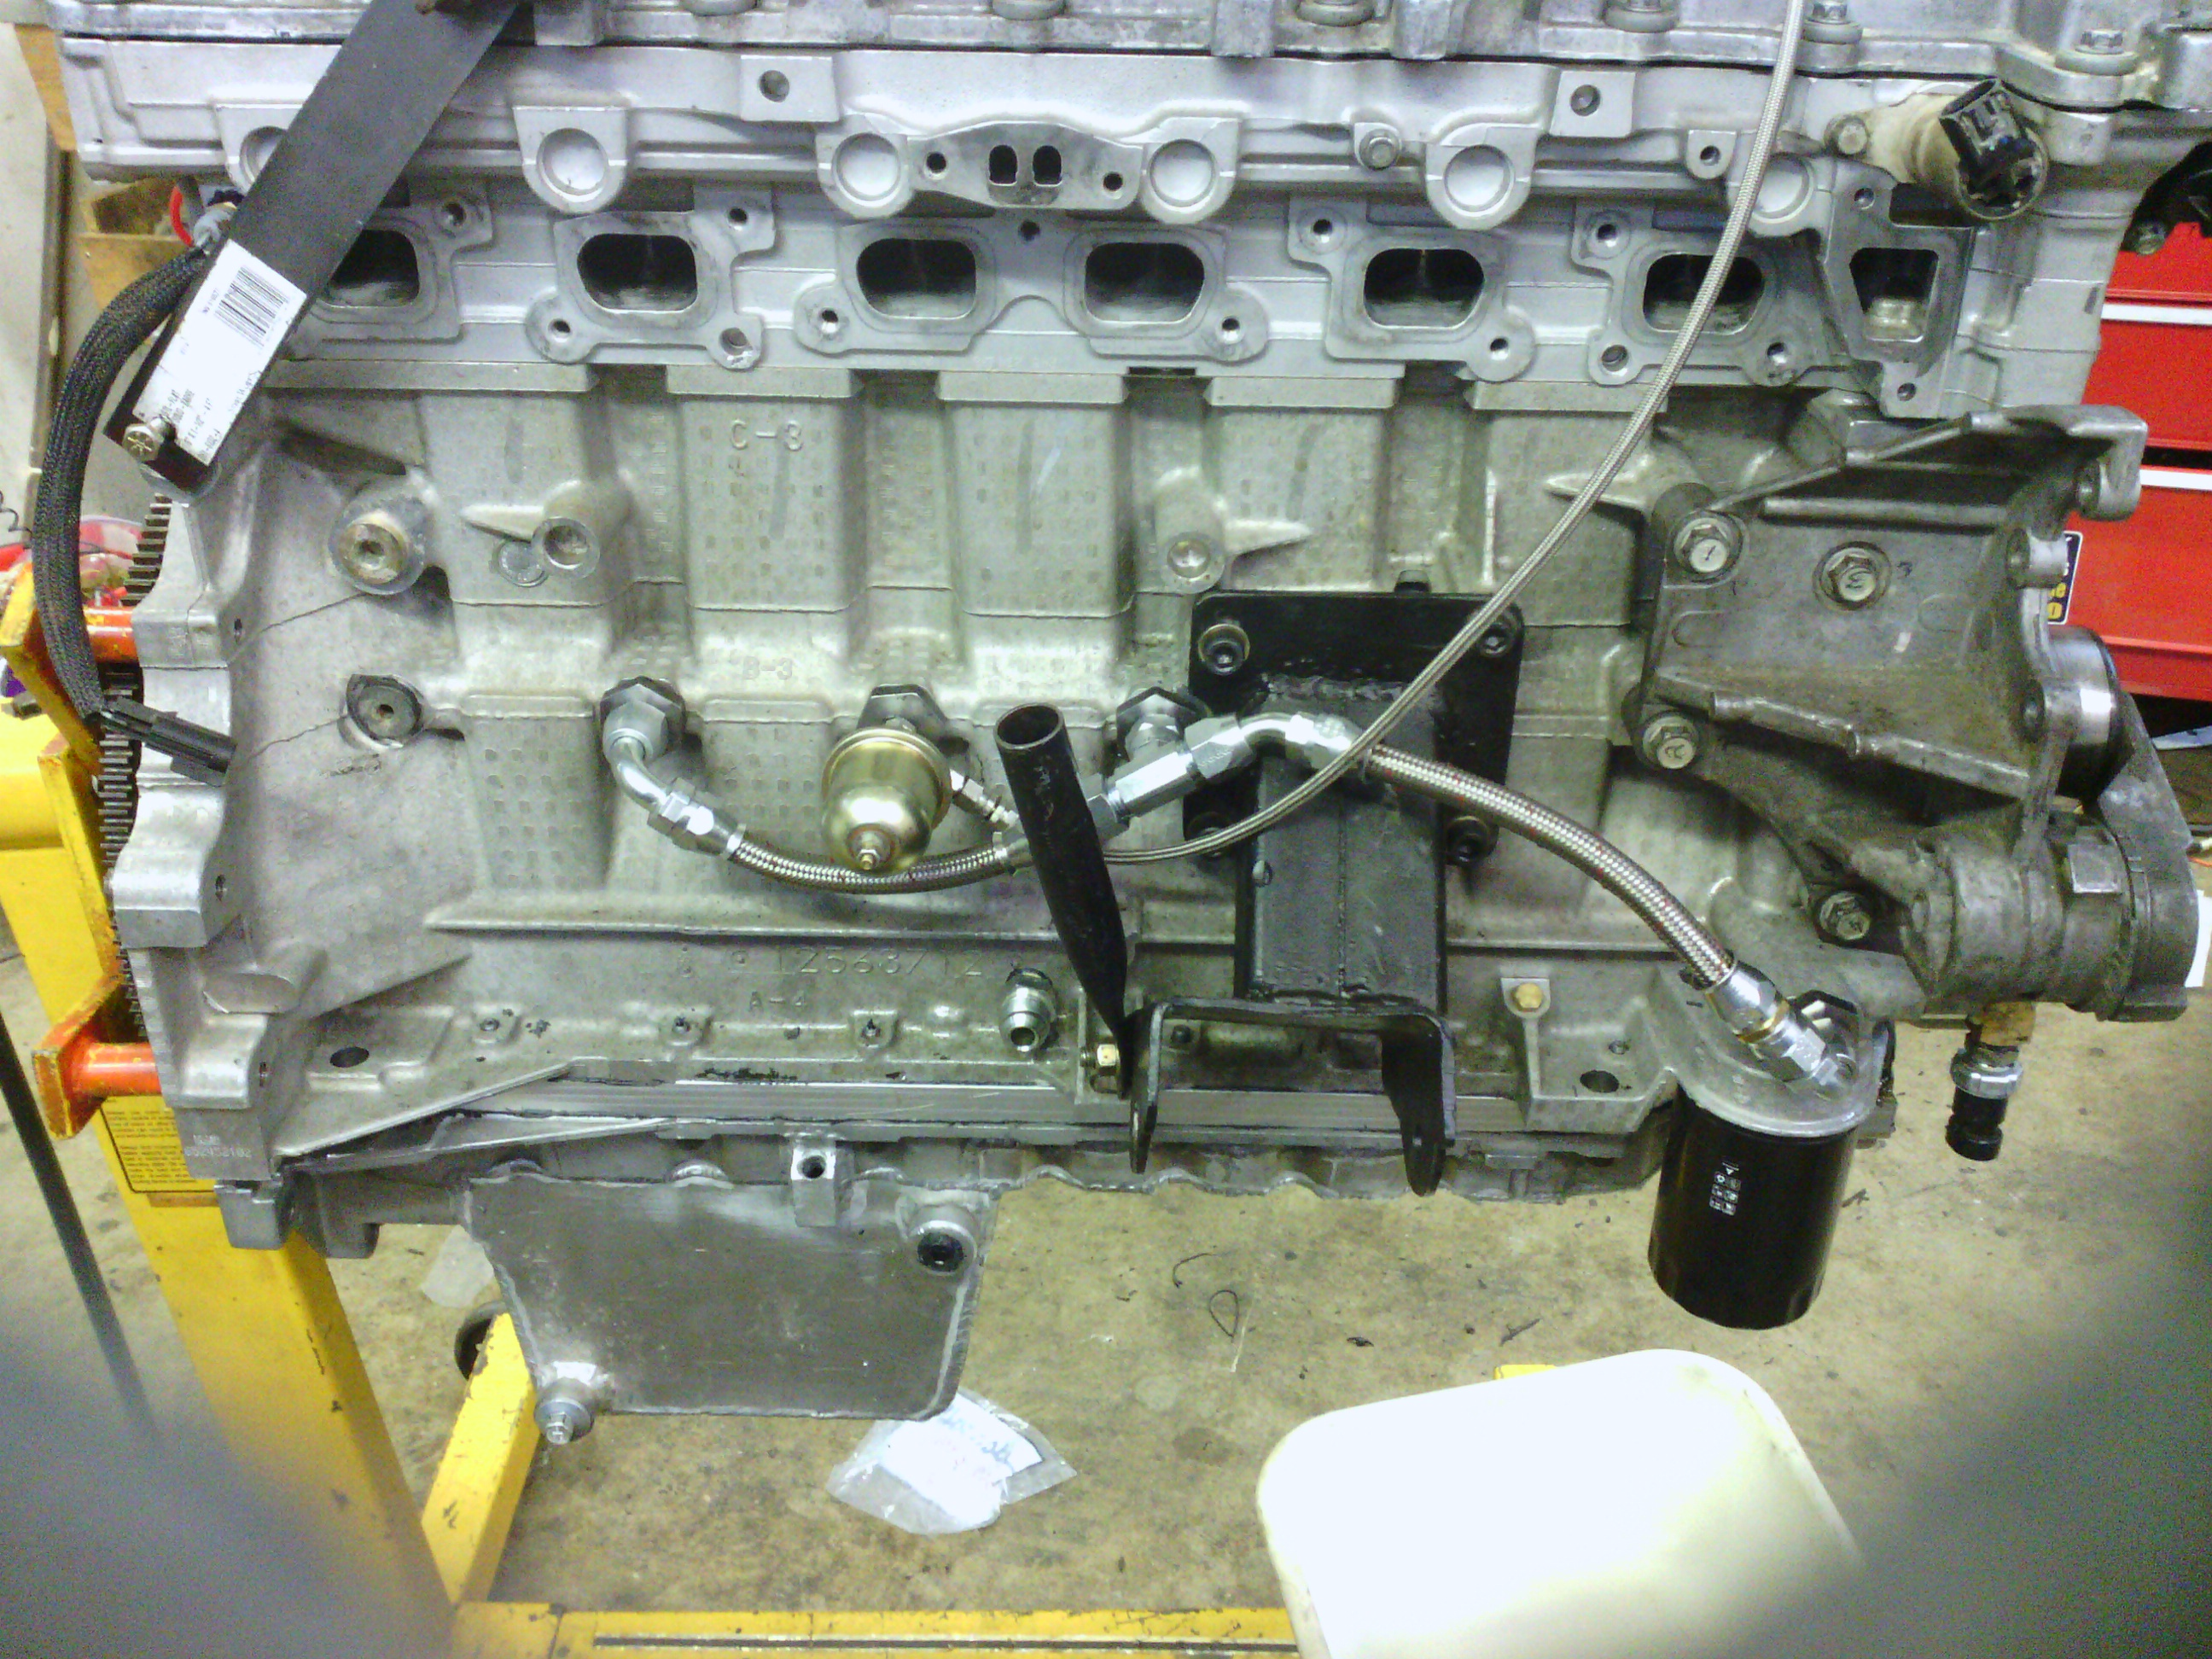 Gmc Vortec 4200 Engine Diagram Pioneer Radio Wiring Harness Adapters – International 4200 Engine Diagram